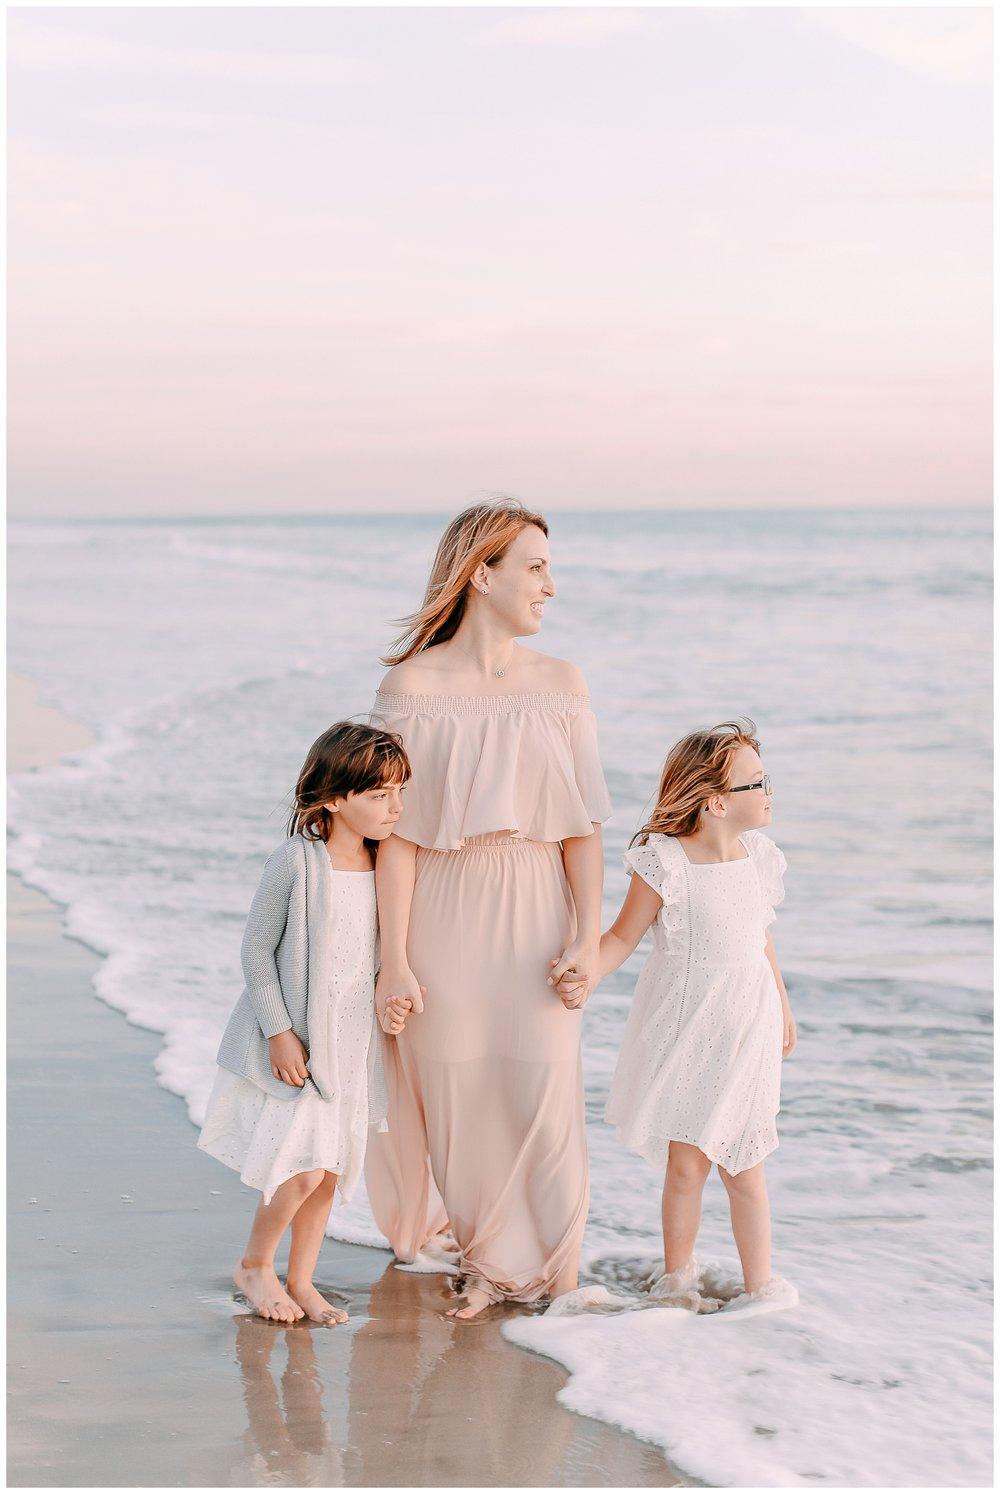 San_clemente_family_session_Orange_county_family_photographer_cori_kleckner_photography_laguna_beach_family_session_0713.jpg